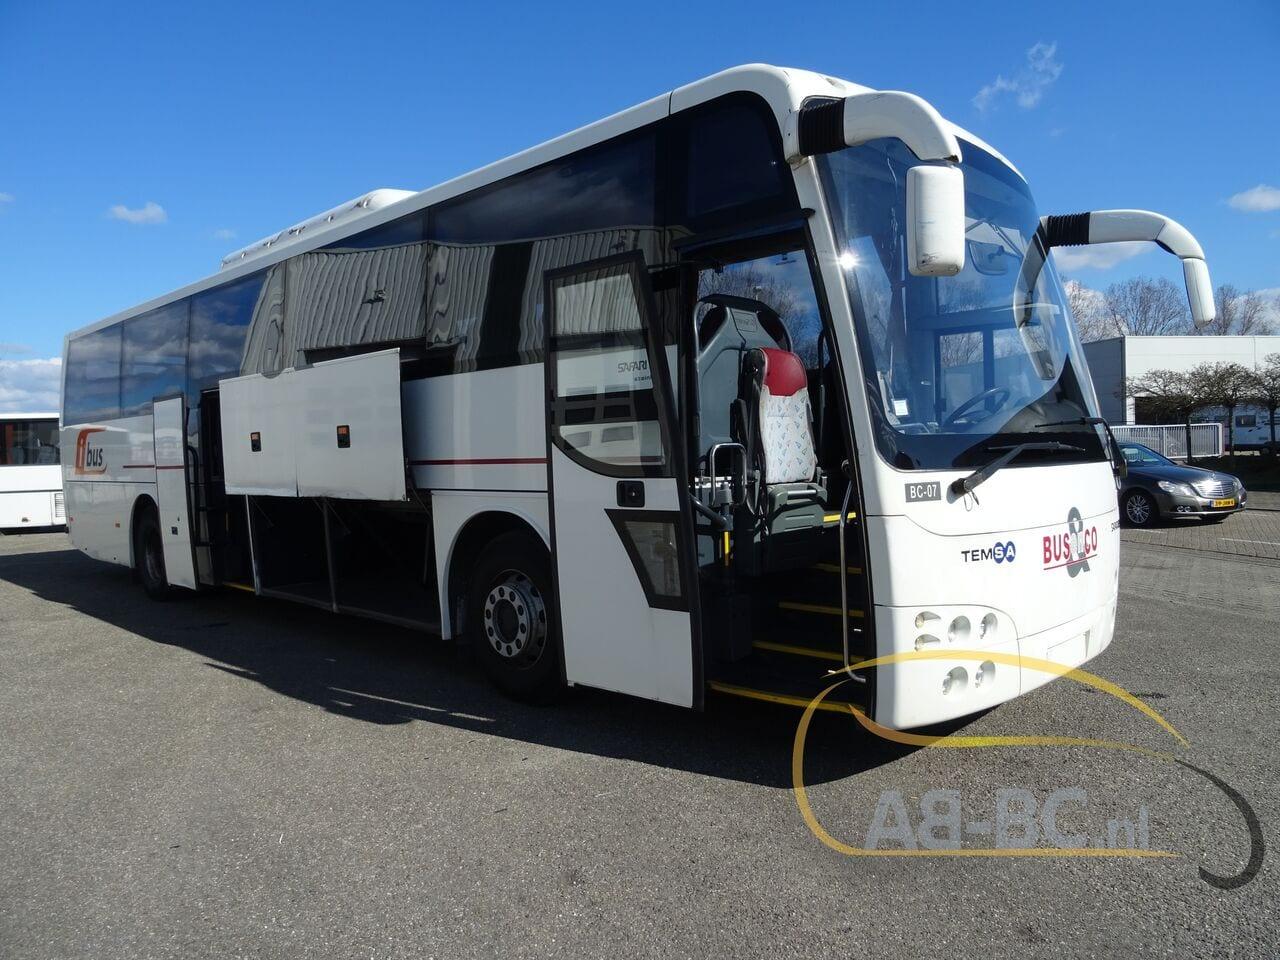 coach-busTEMSA-Safari-RD-53-Seats-DAF-Motor-12-mtr---1616166473228845671_big_33b7411c31b7651a29343582cca4922f--21031917053743807500